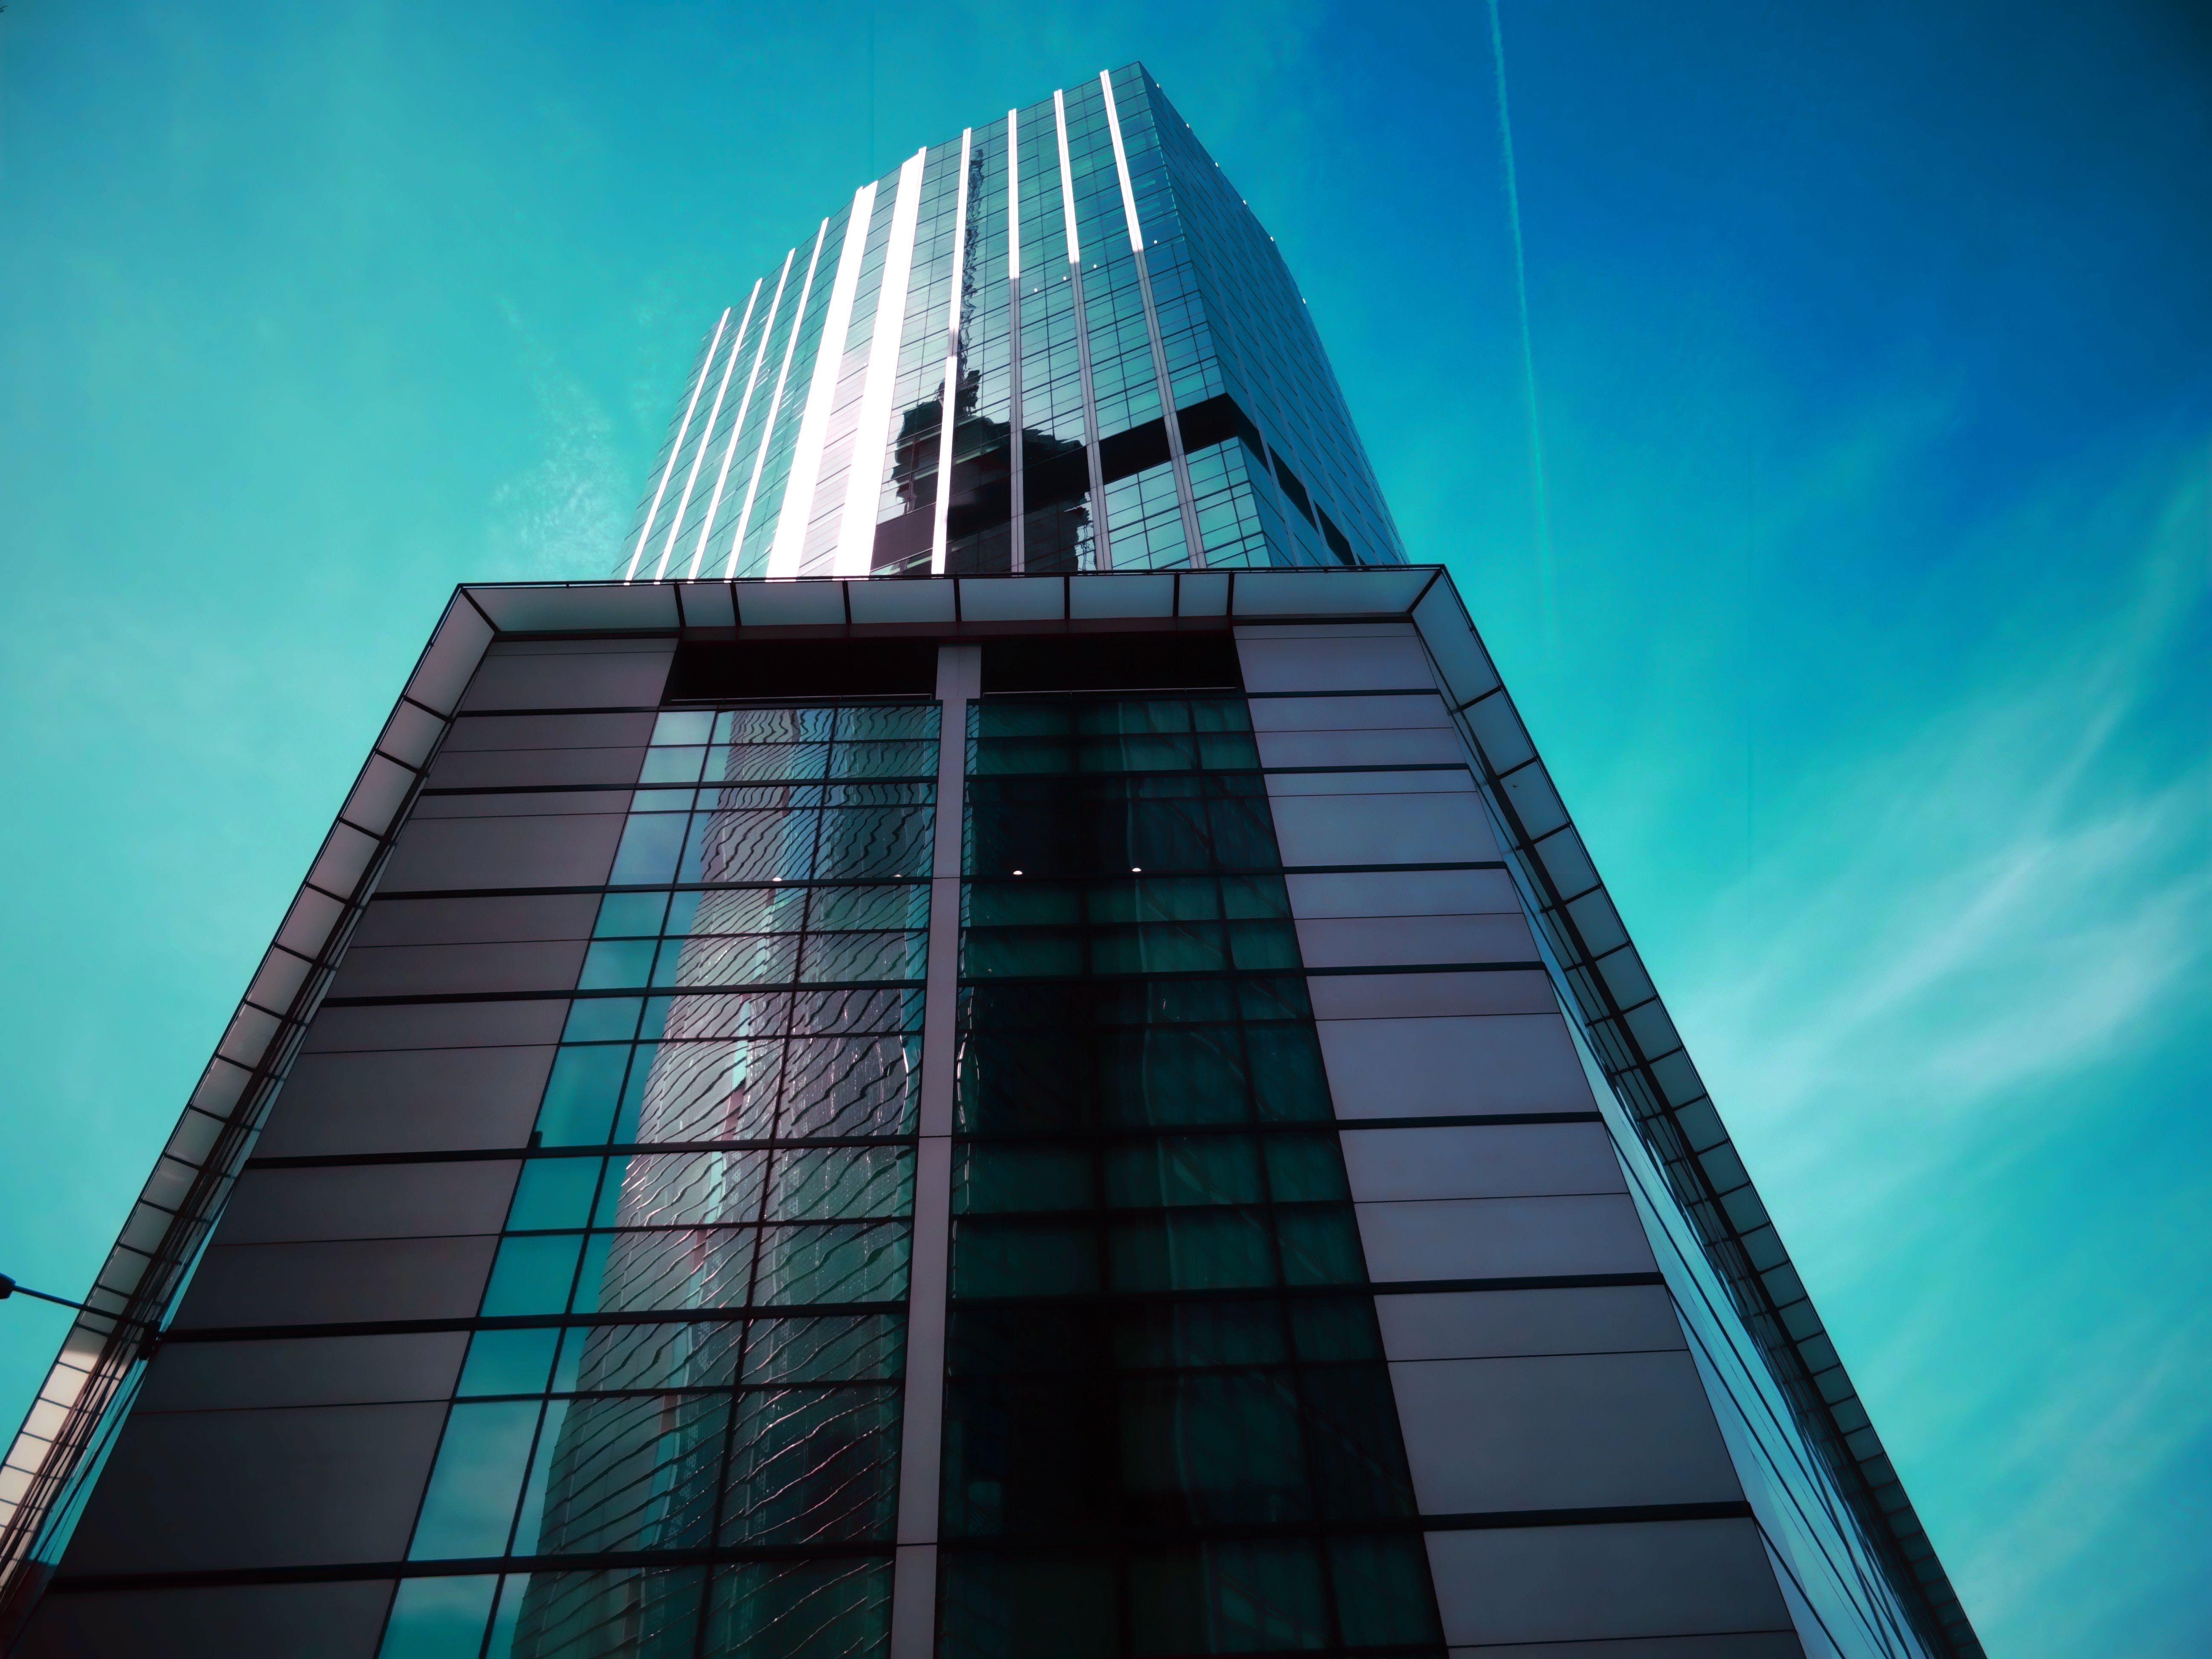 Commercial Building Under Blue Sky